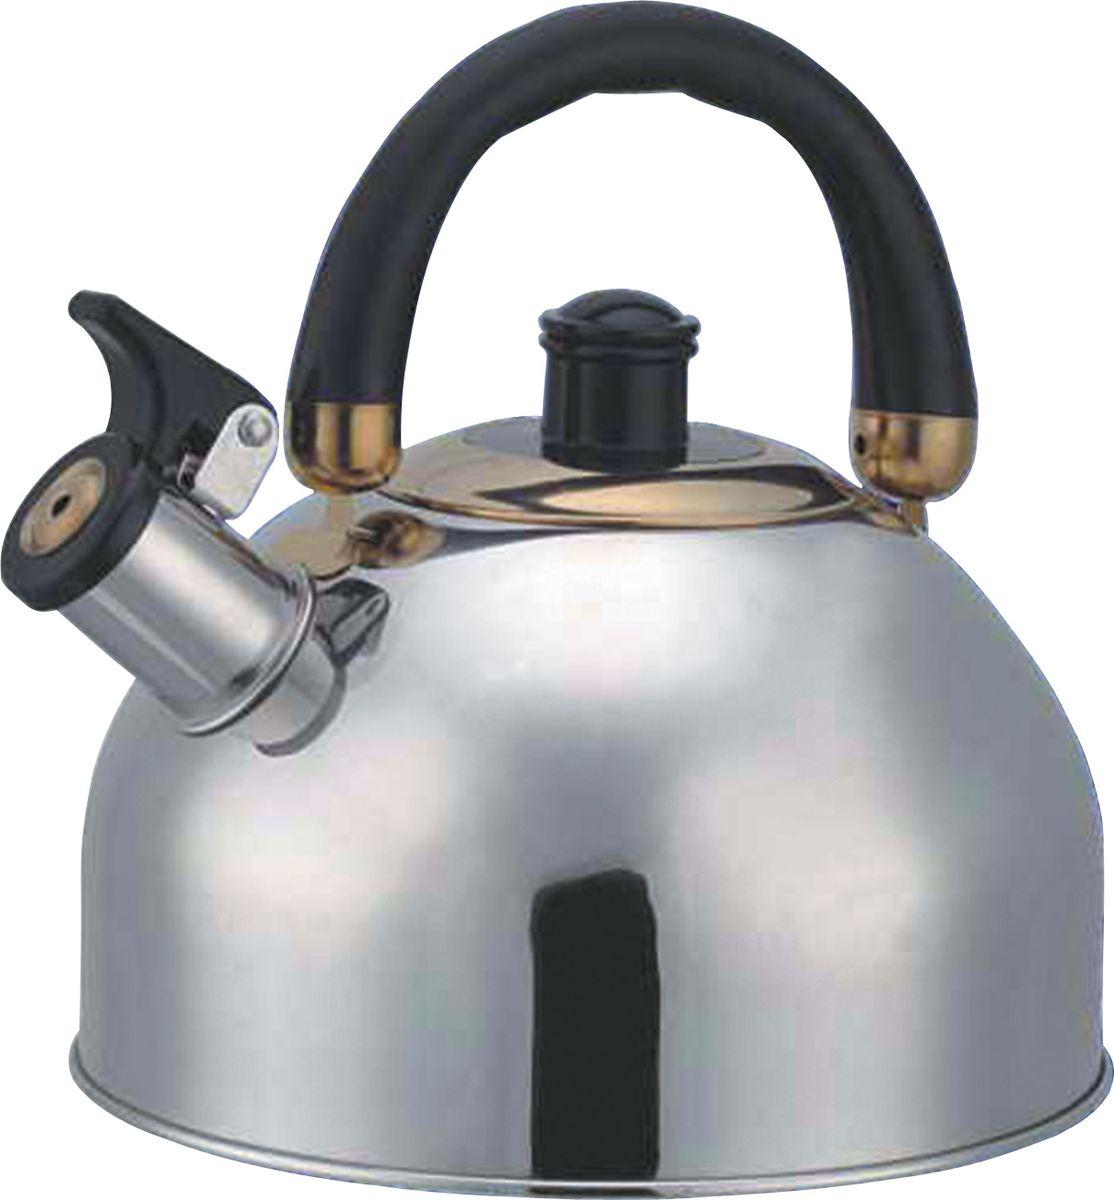 Чайник Bohmann, со свистком, 4,5 л. 645BHLBK чайник bohmann bhl 642 gdo